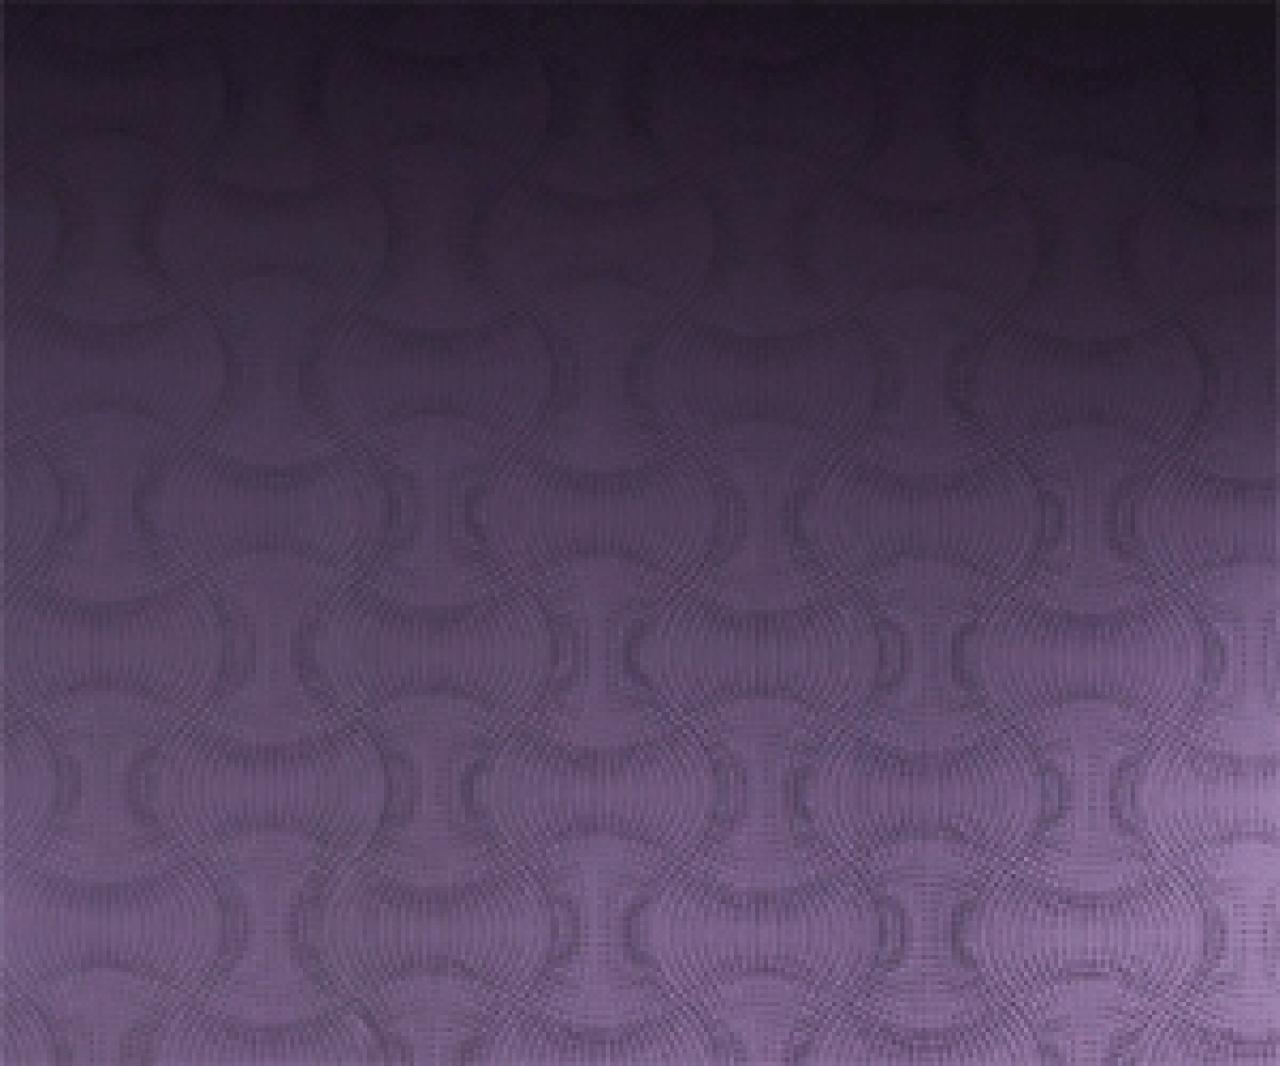 Purple living room or bedroom wallpaper contemporary designer curve 1280x1066